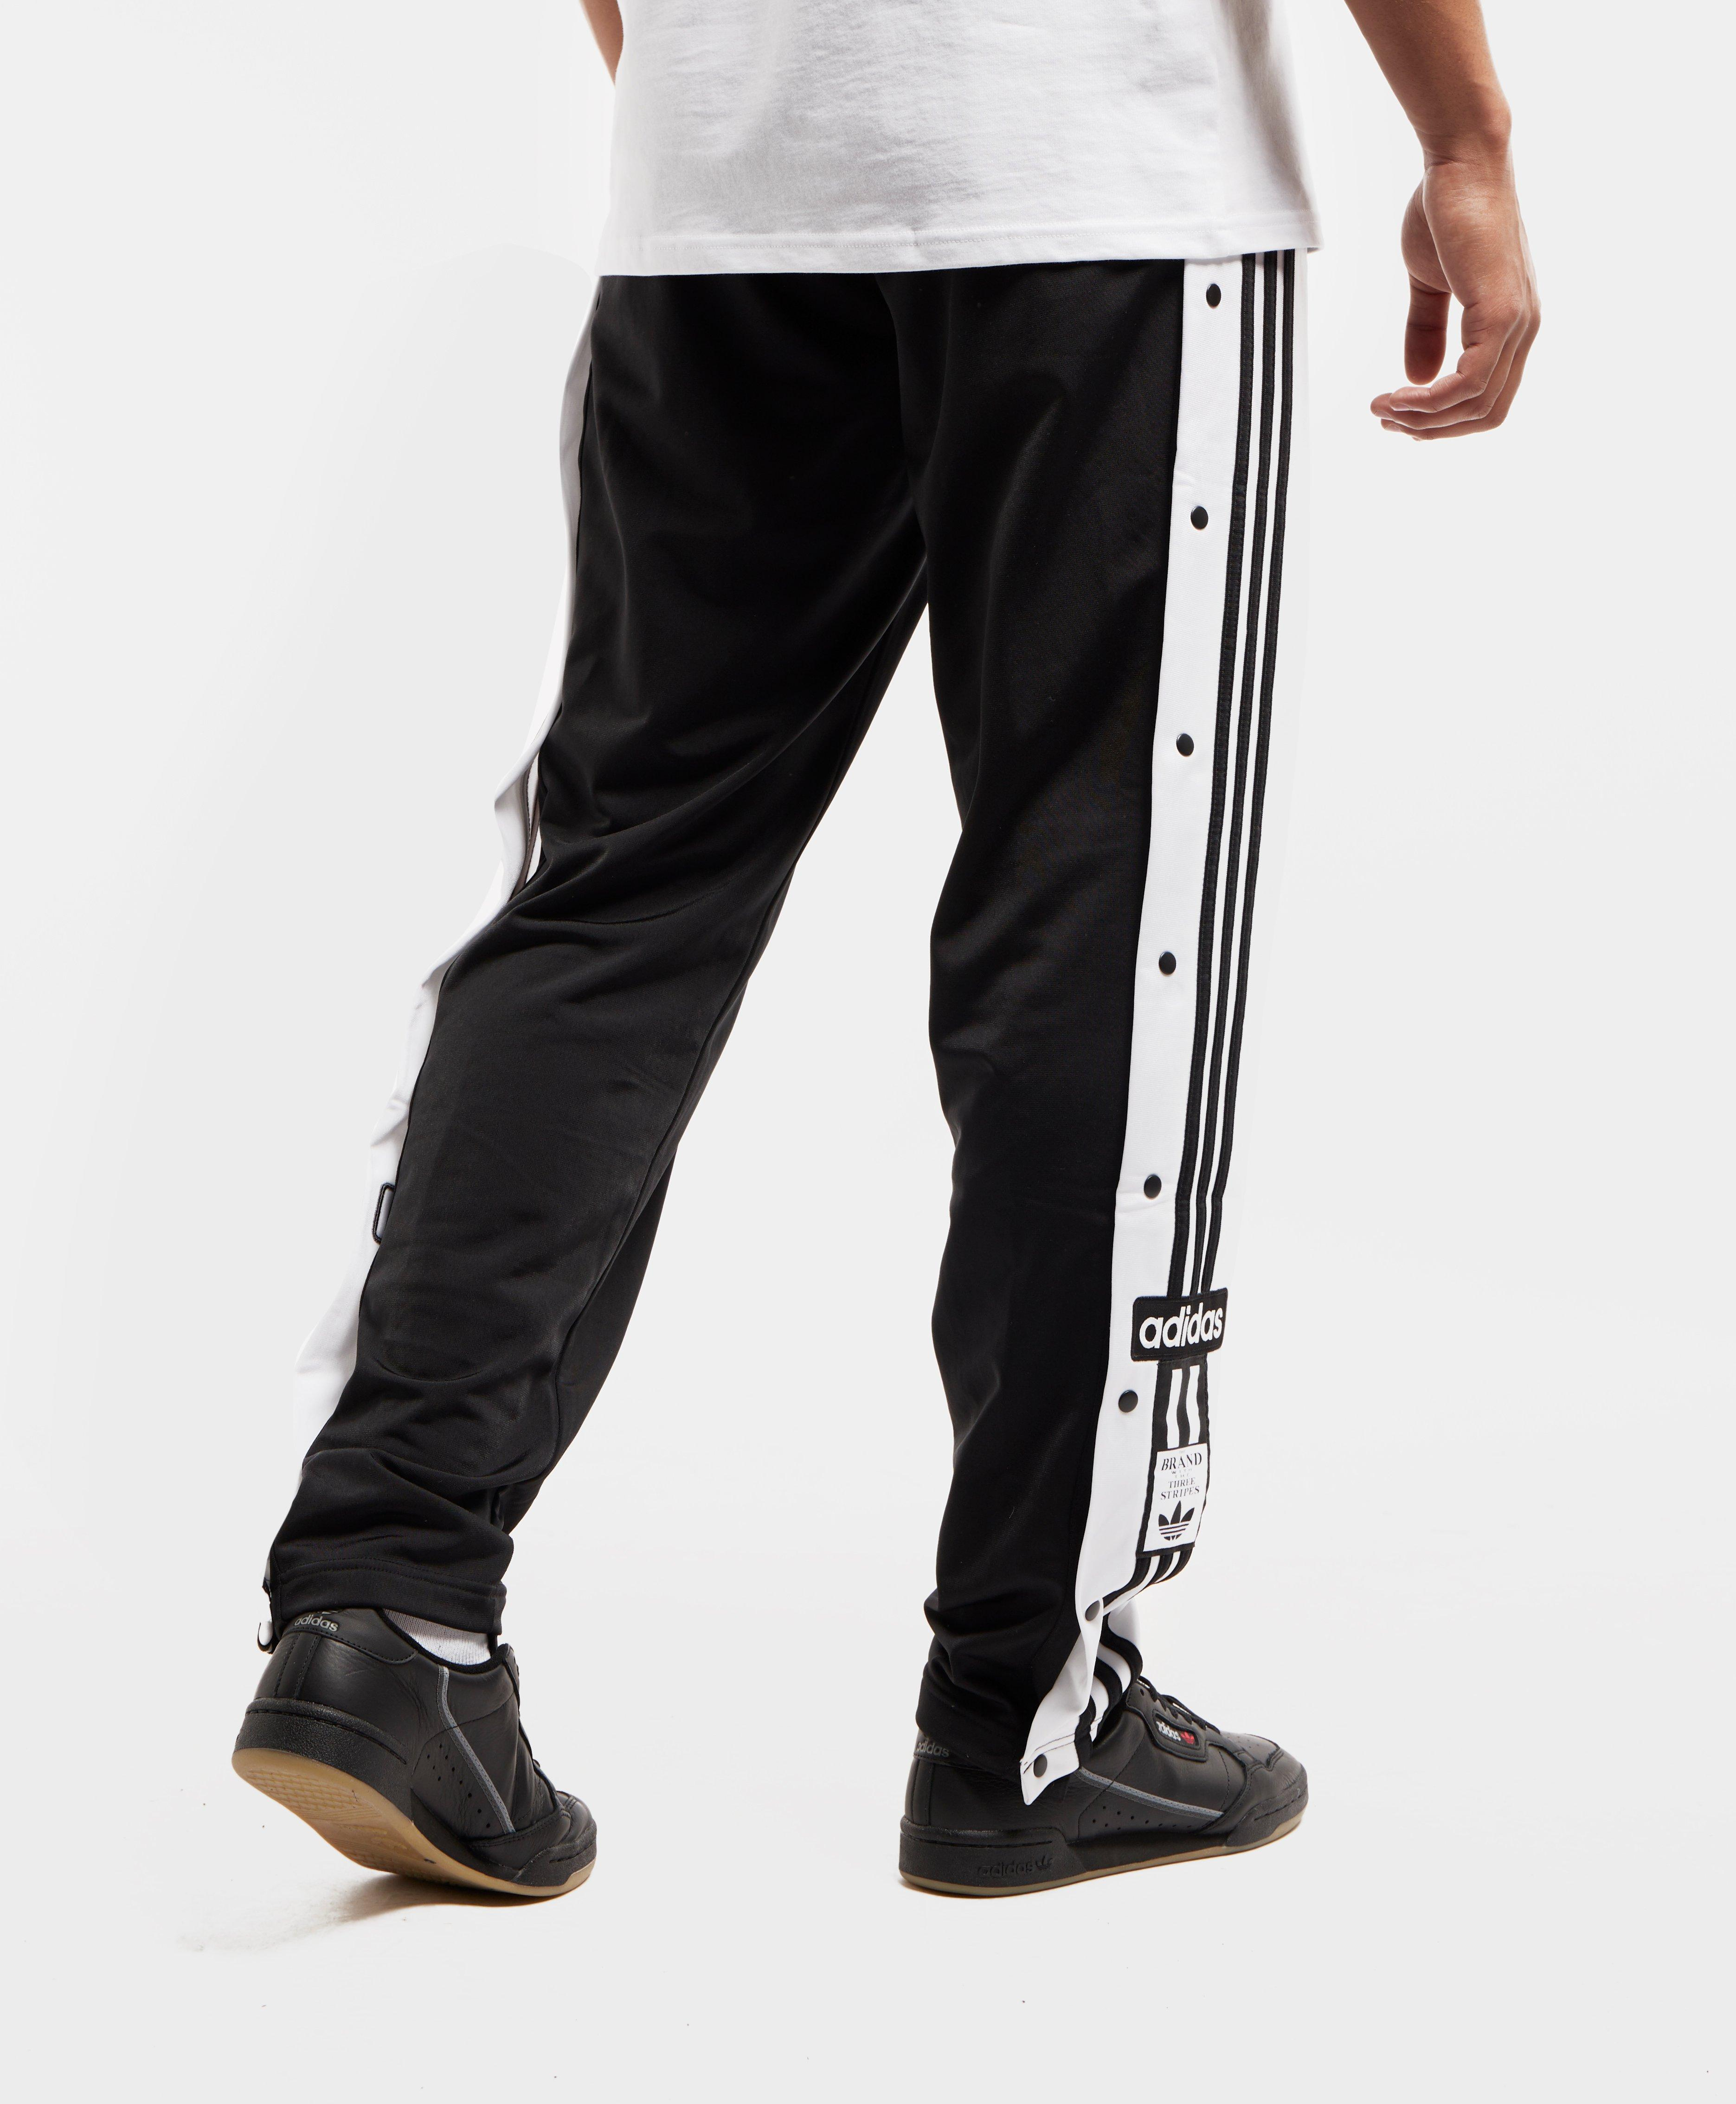 74e8209d32d0 Lyst - adidas Originals Adi Snap Button Track Pants in Black for Men